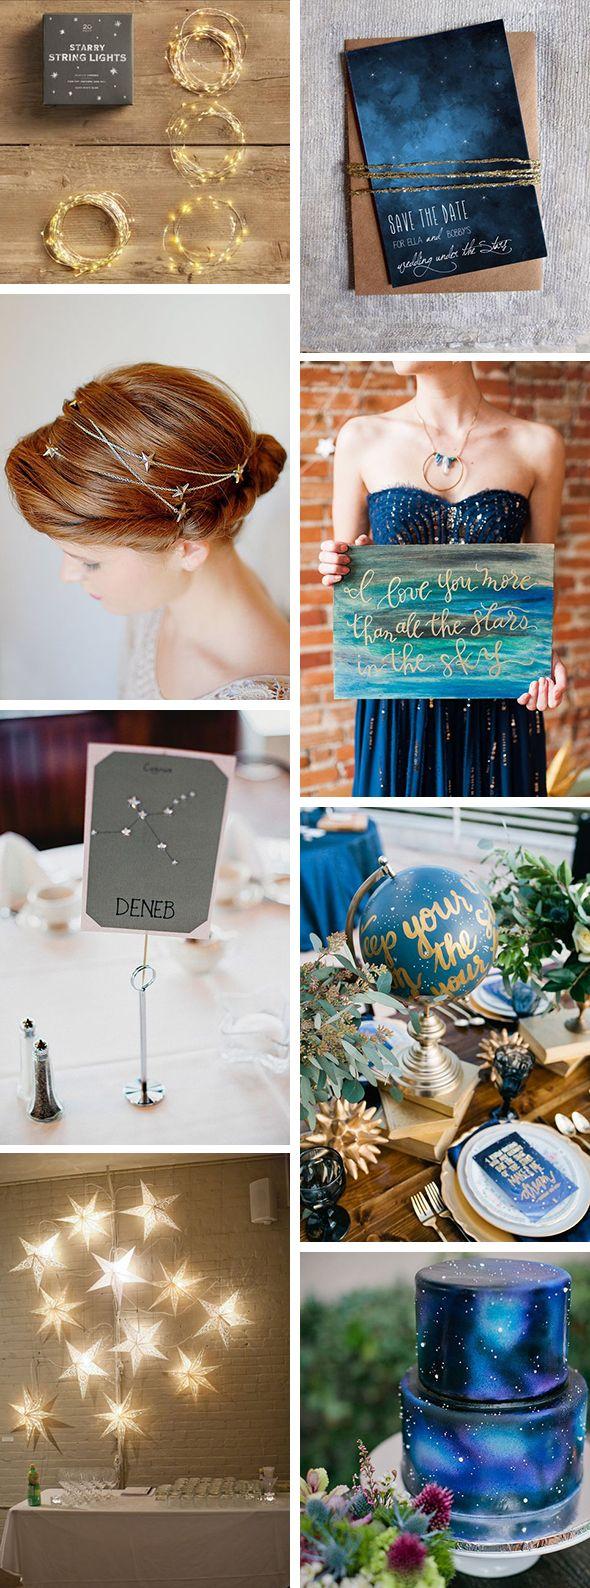 star themed weddings                                                                                                                                                      More